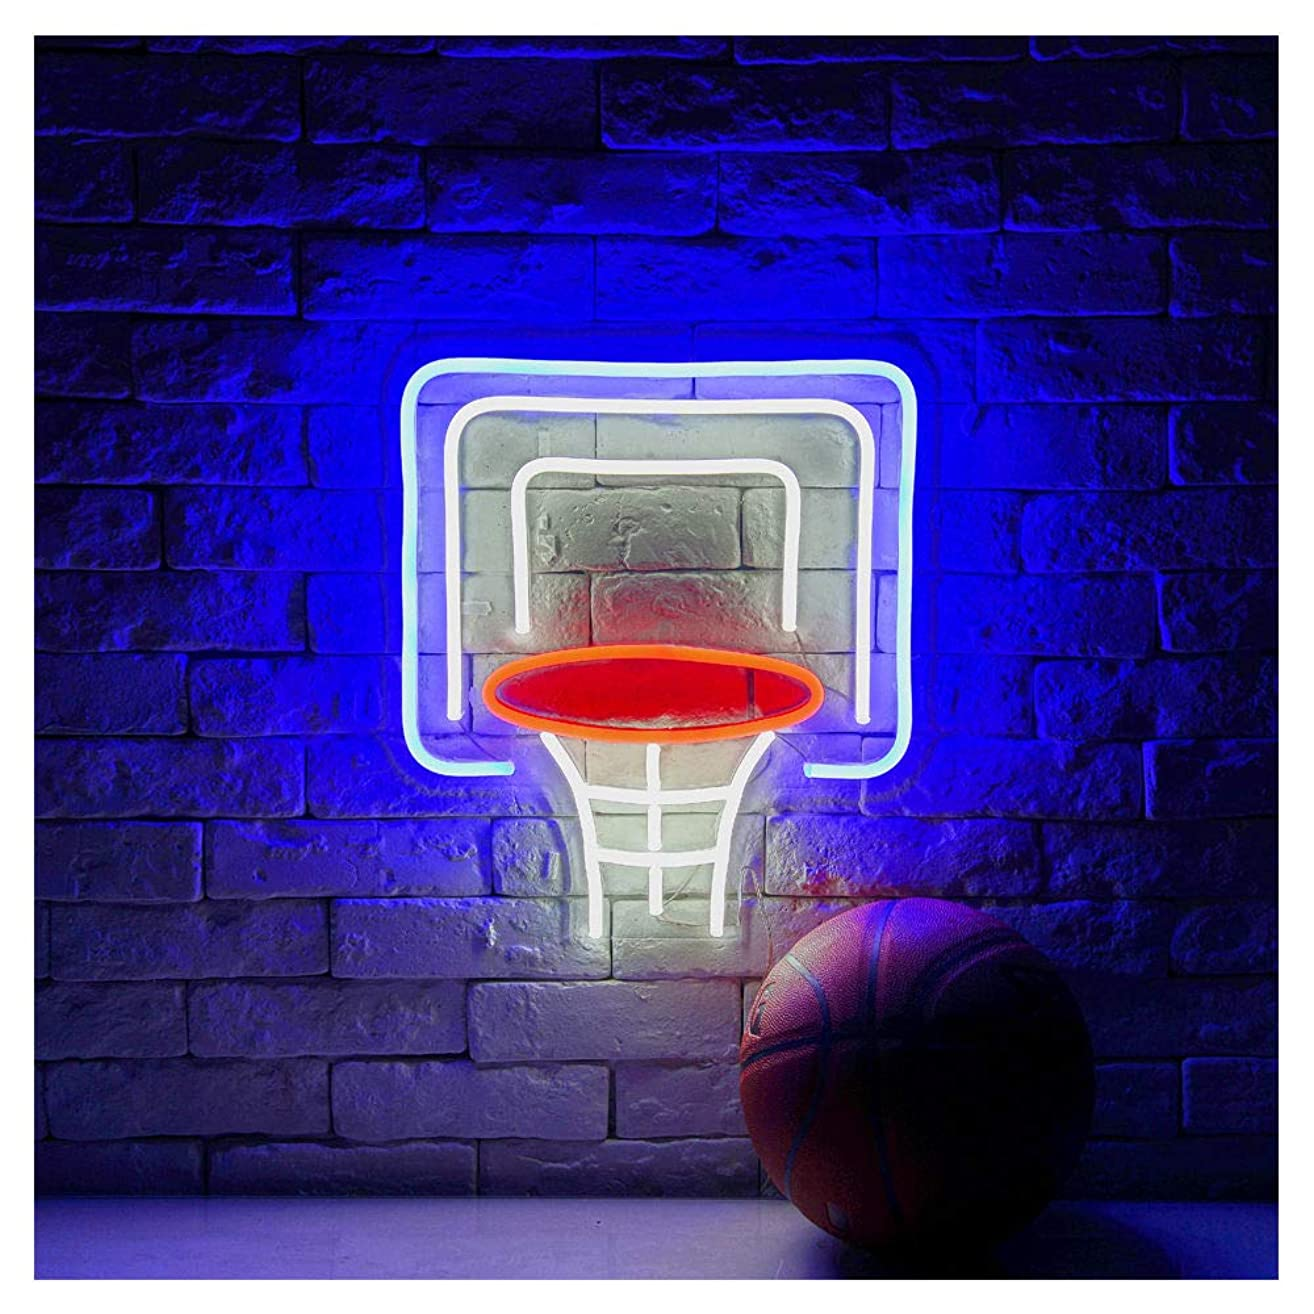 Basketball Hoop LED Neon Sign Lights Art Wall Decorative Lights14.88''x16.6'' (Basketball Hoop-Blue/White/Red)